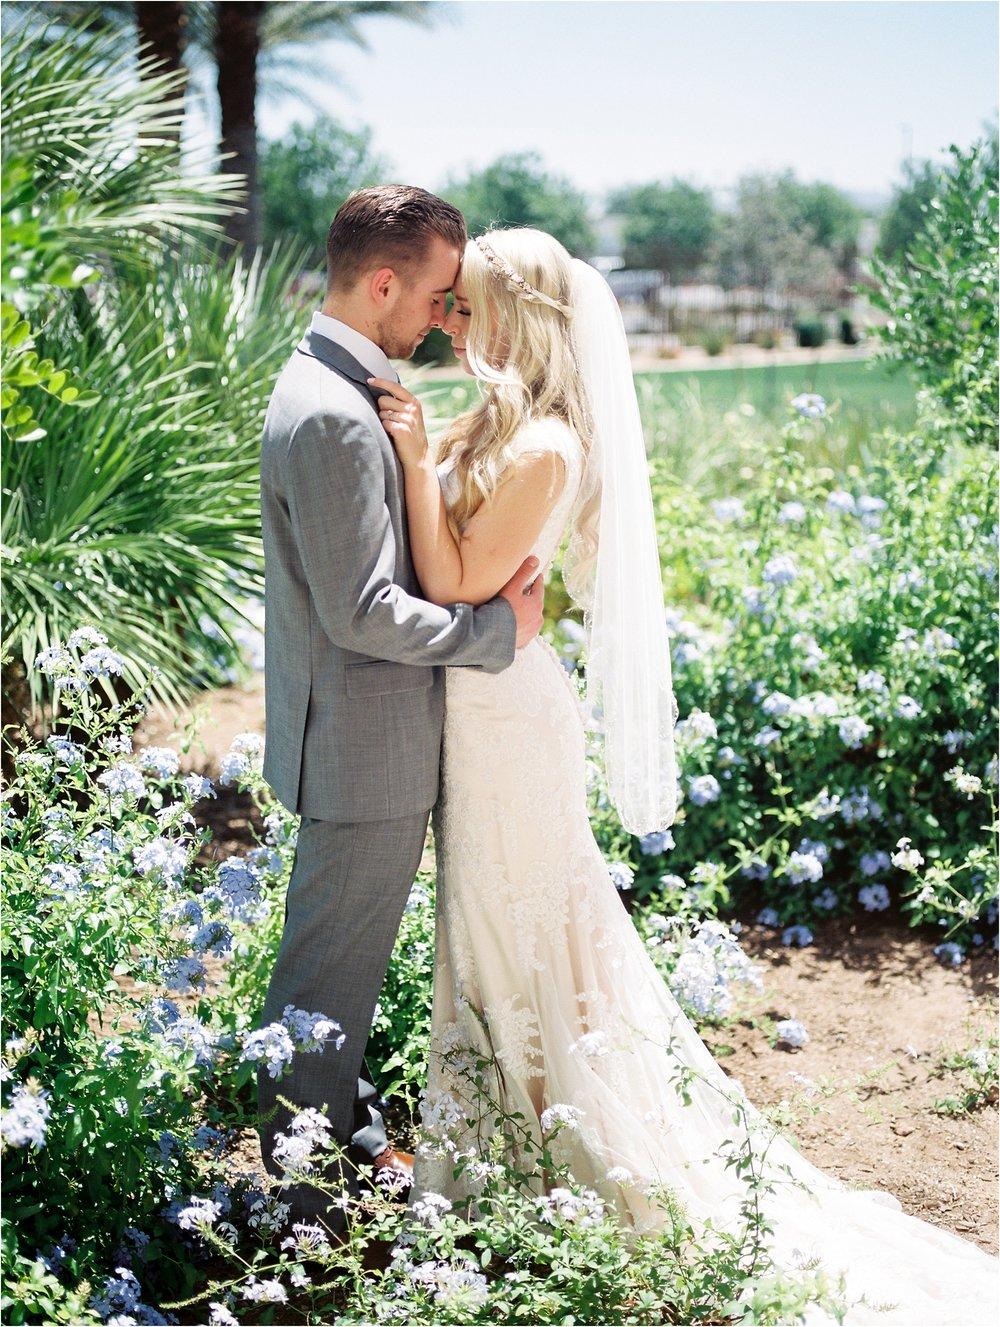 Sarah Jane Photography Film Hybrid Scottsdale Phoenix Arizona Destination Wedding Photographer Julie ans Mason_0022.jpg